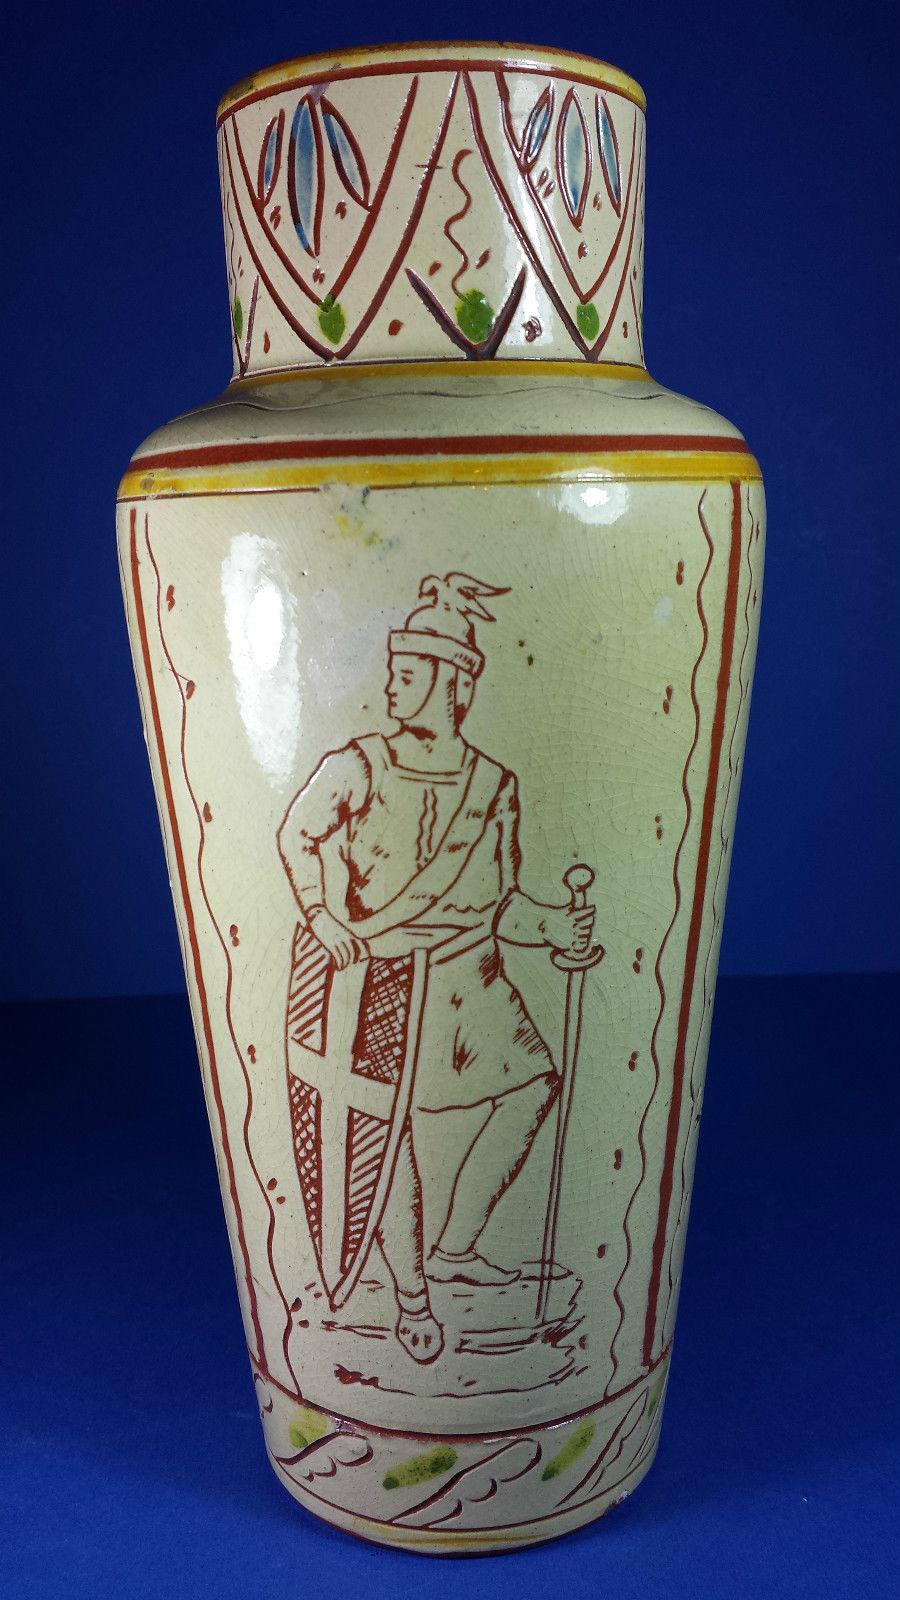 £94 Aller Vale vase with sgraffito knight Nov \'15